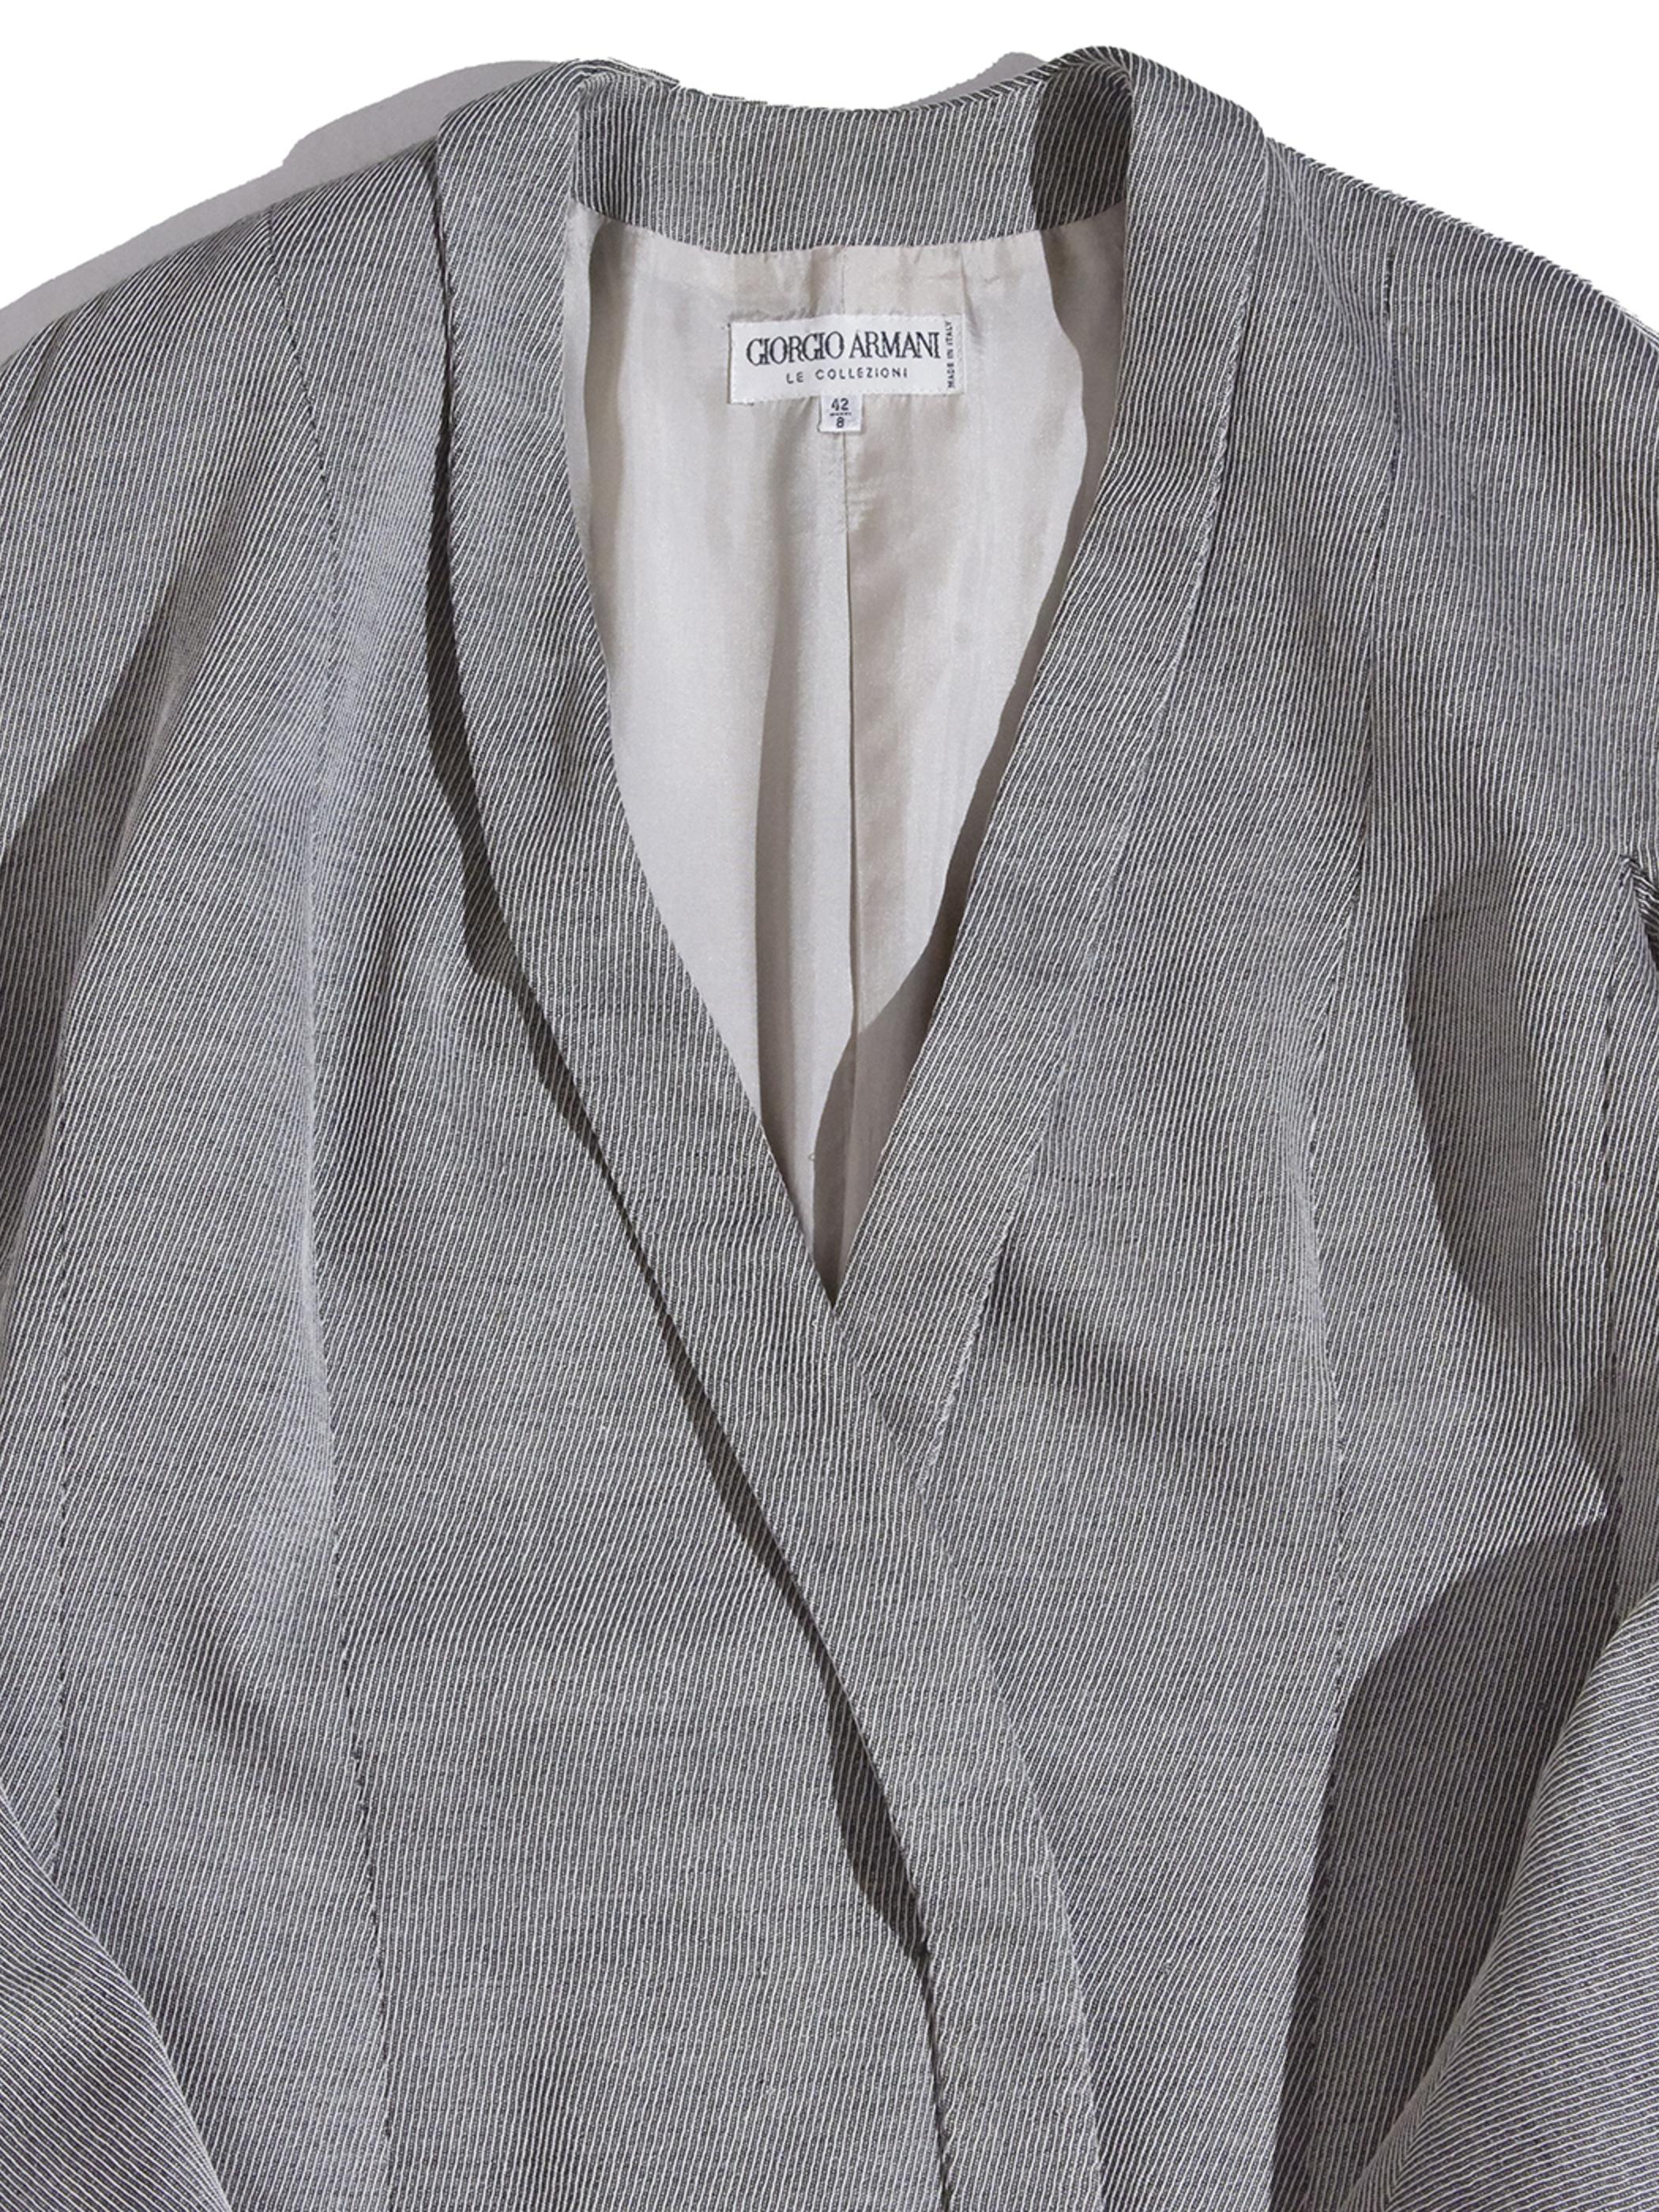 "1980s ""GIORGIO ARMANI"" wool code lane cardigan jacket -GRAY-"